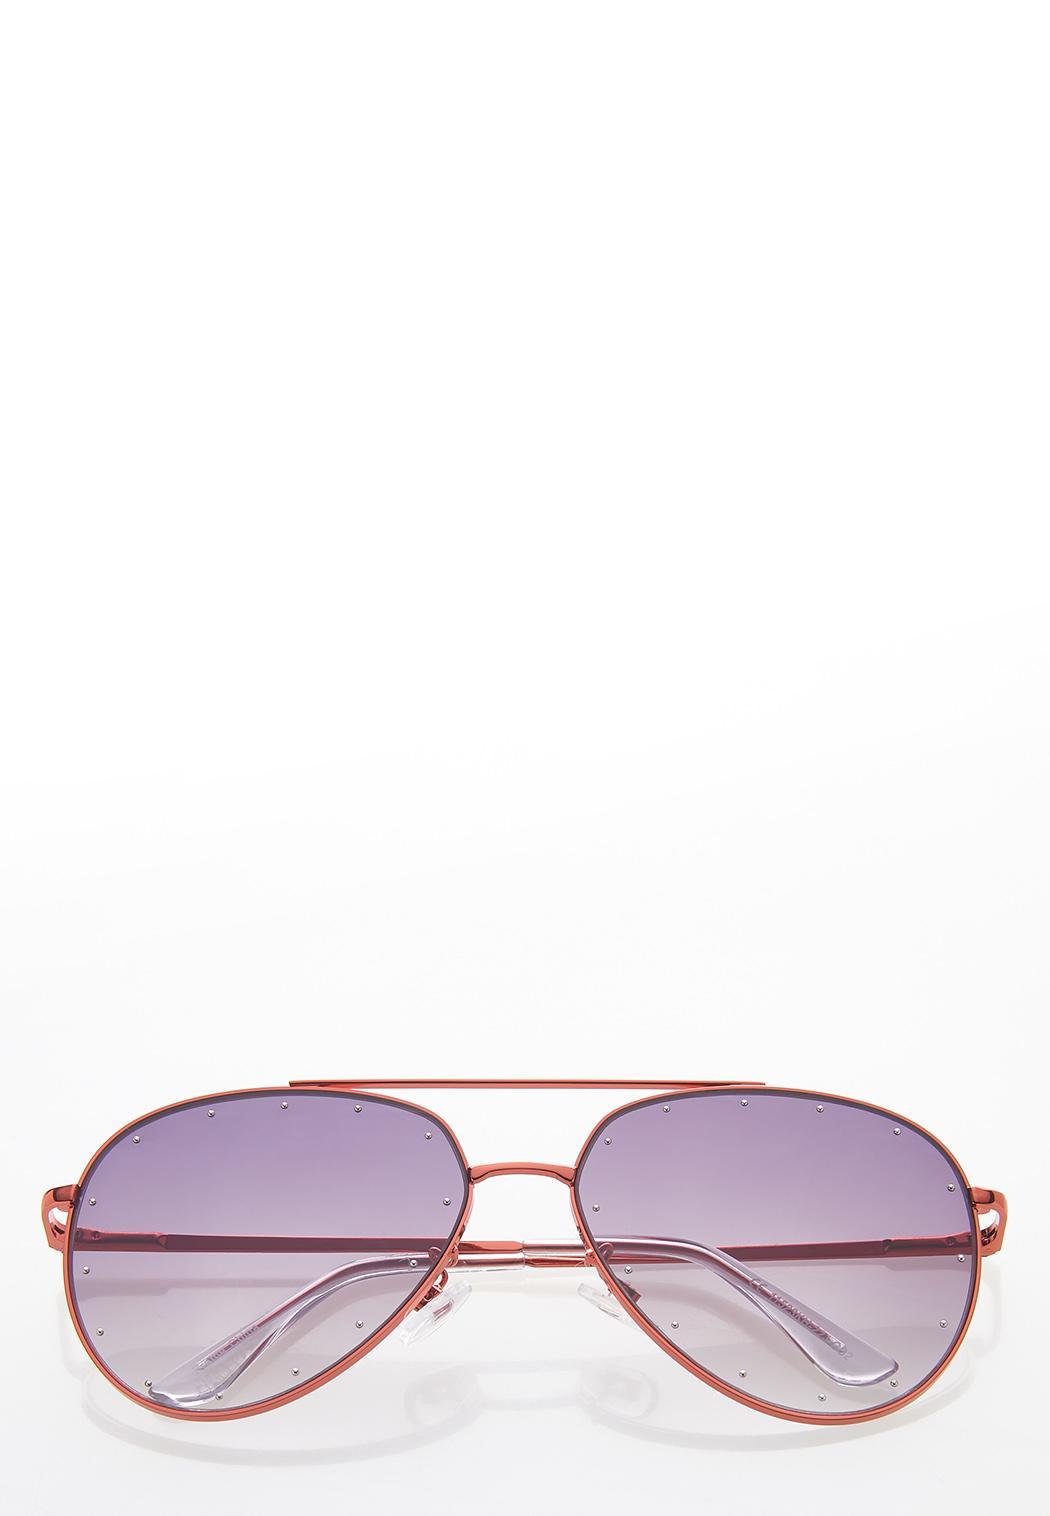 Autumn Aviator Sunglasses